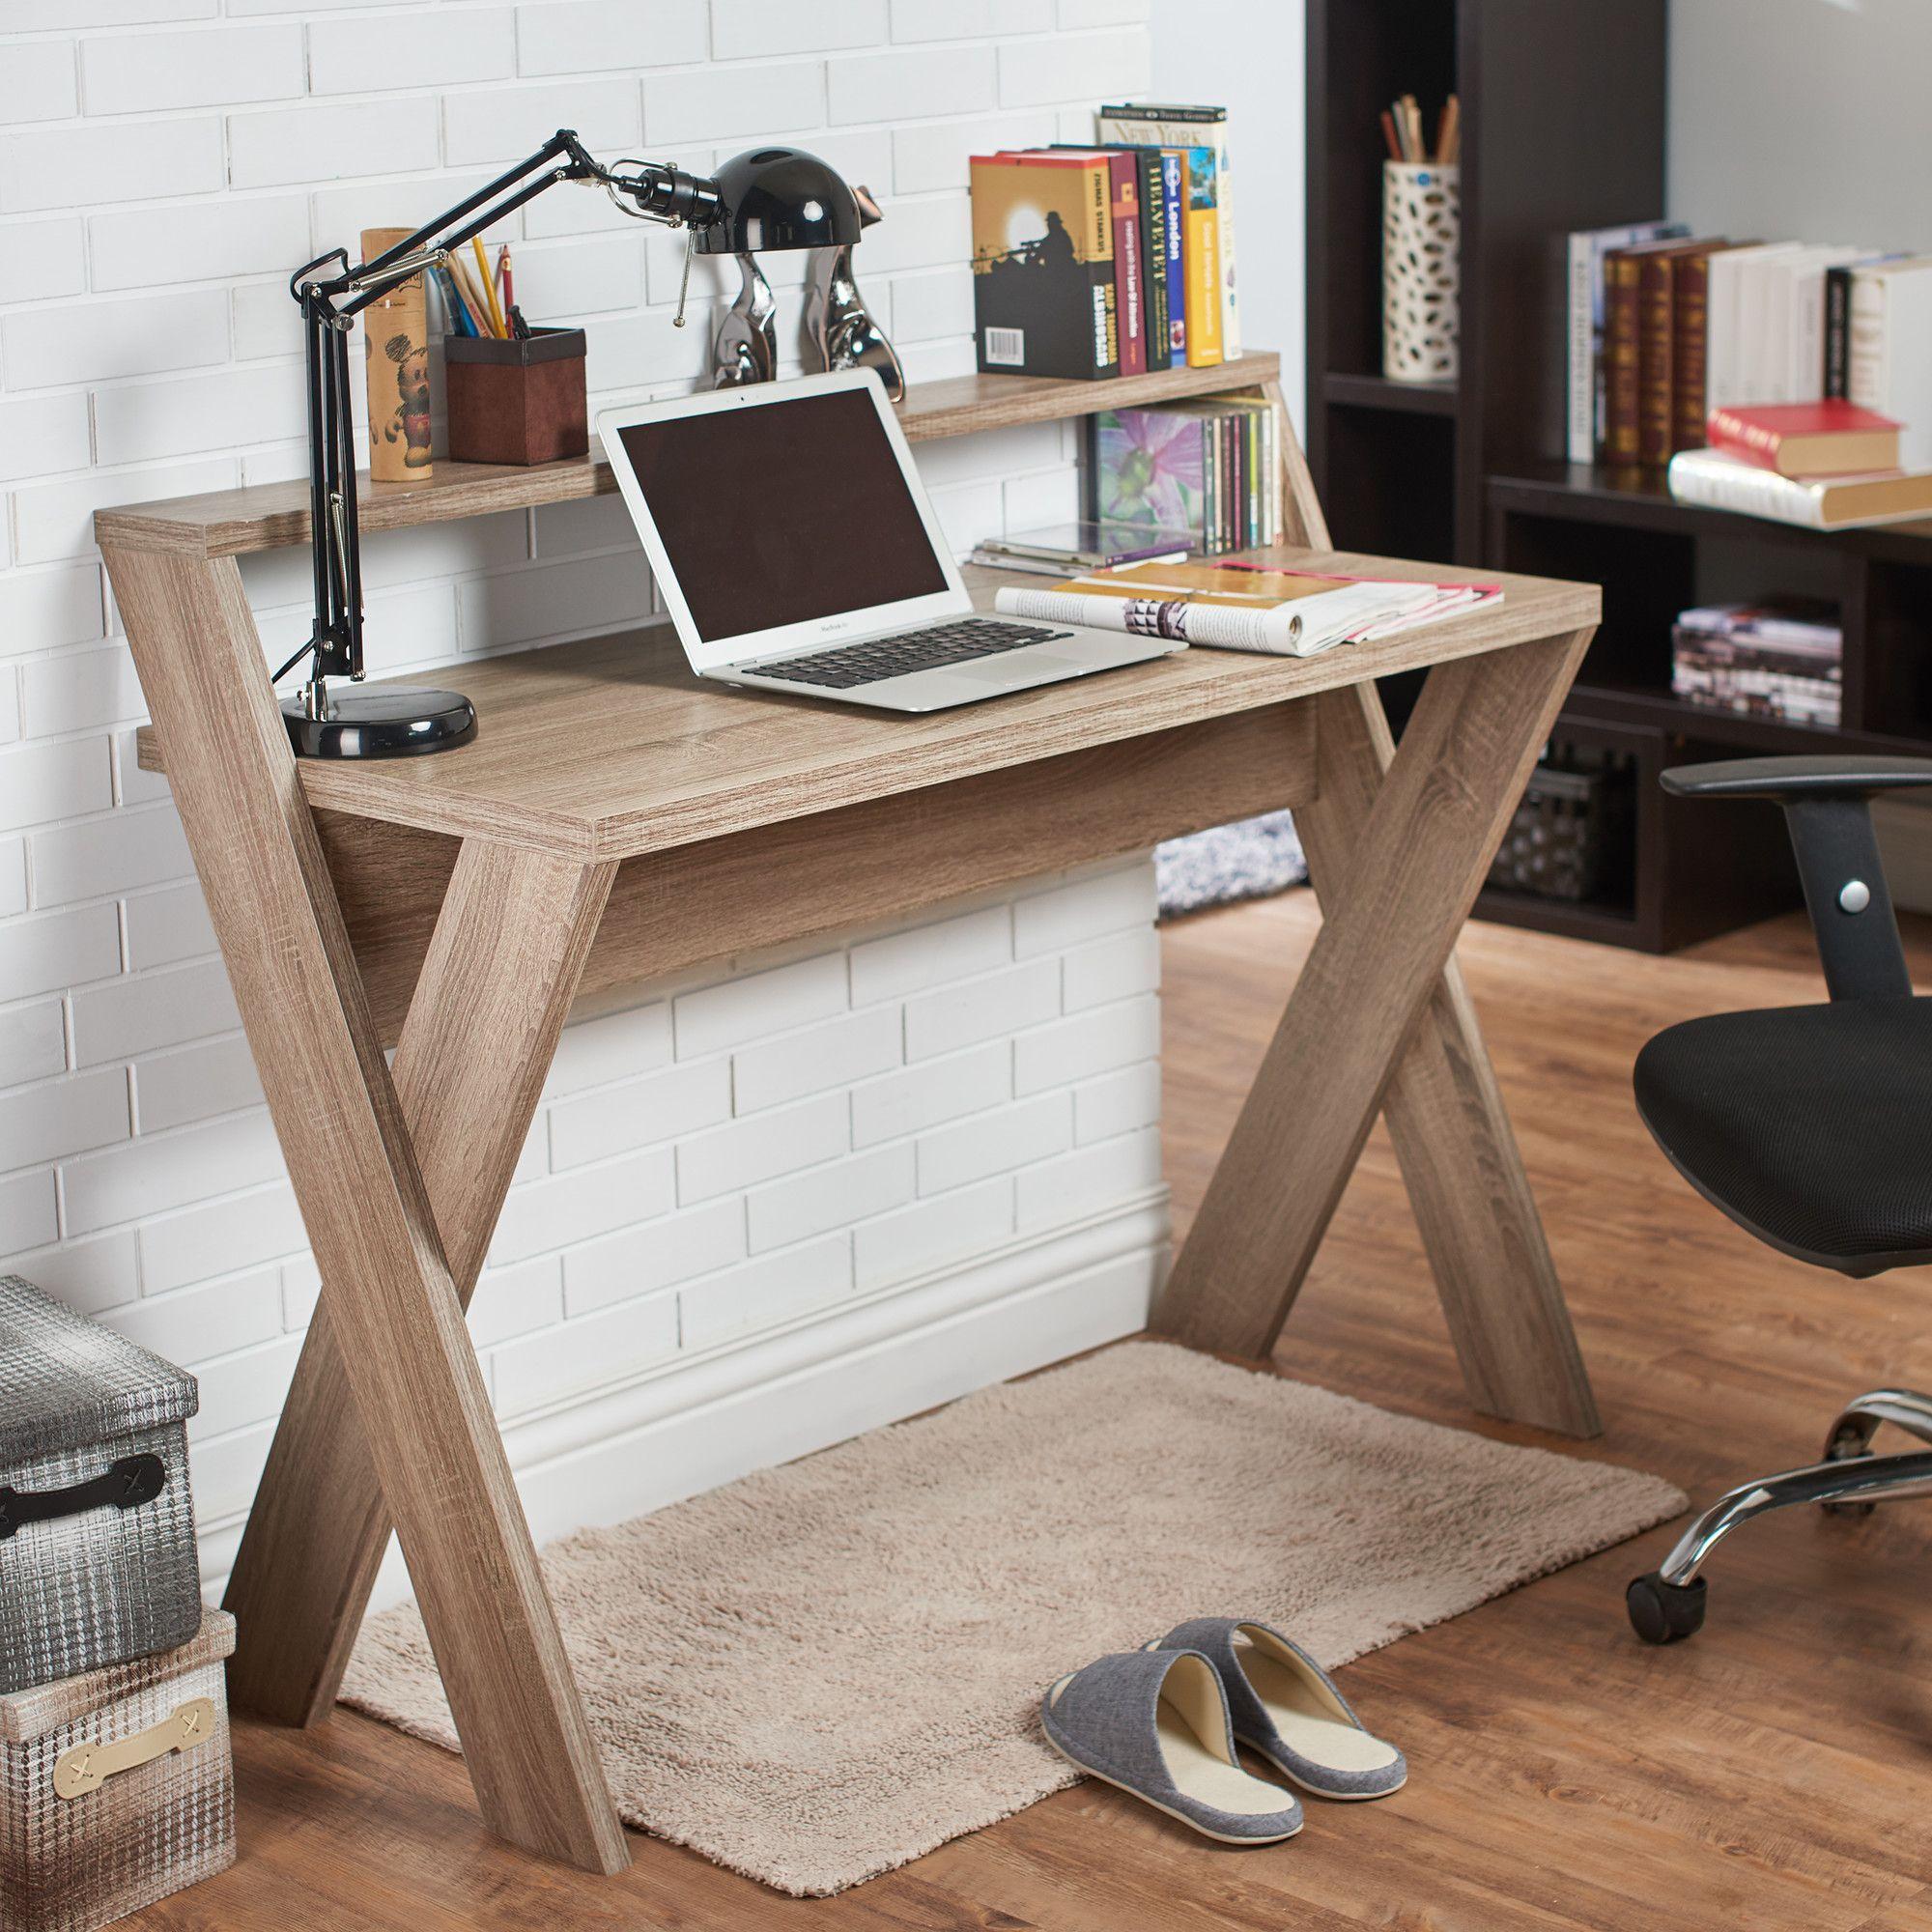 hokku designs carmelo writing desk allmodern home ideas in 2019 rh pinterest com